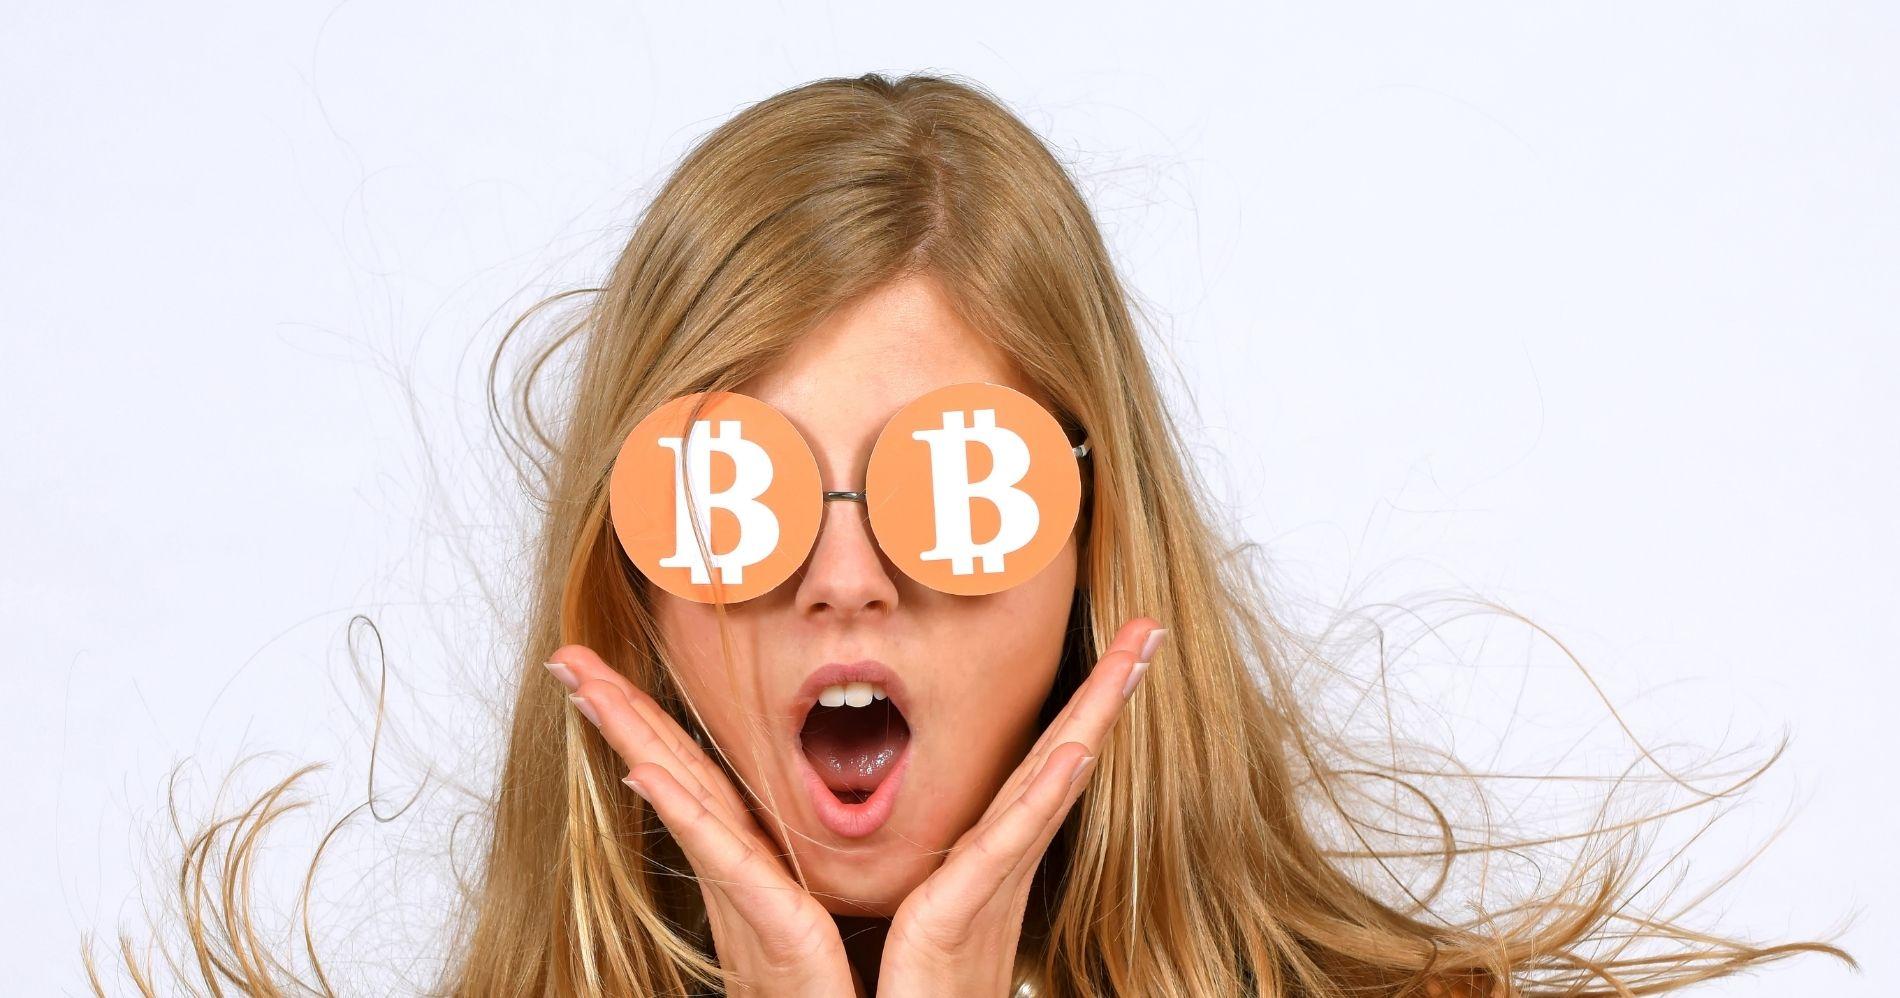 Square Bakal Punya Hardware Wallet bitcoin Illustration Web Bisnis Muda - Canva